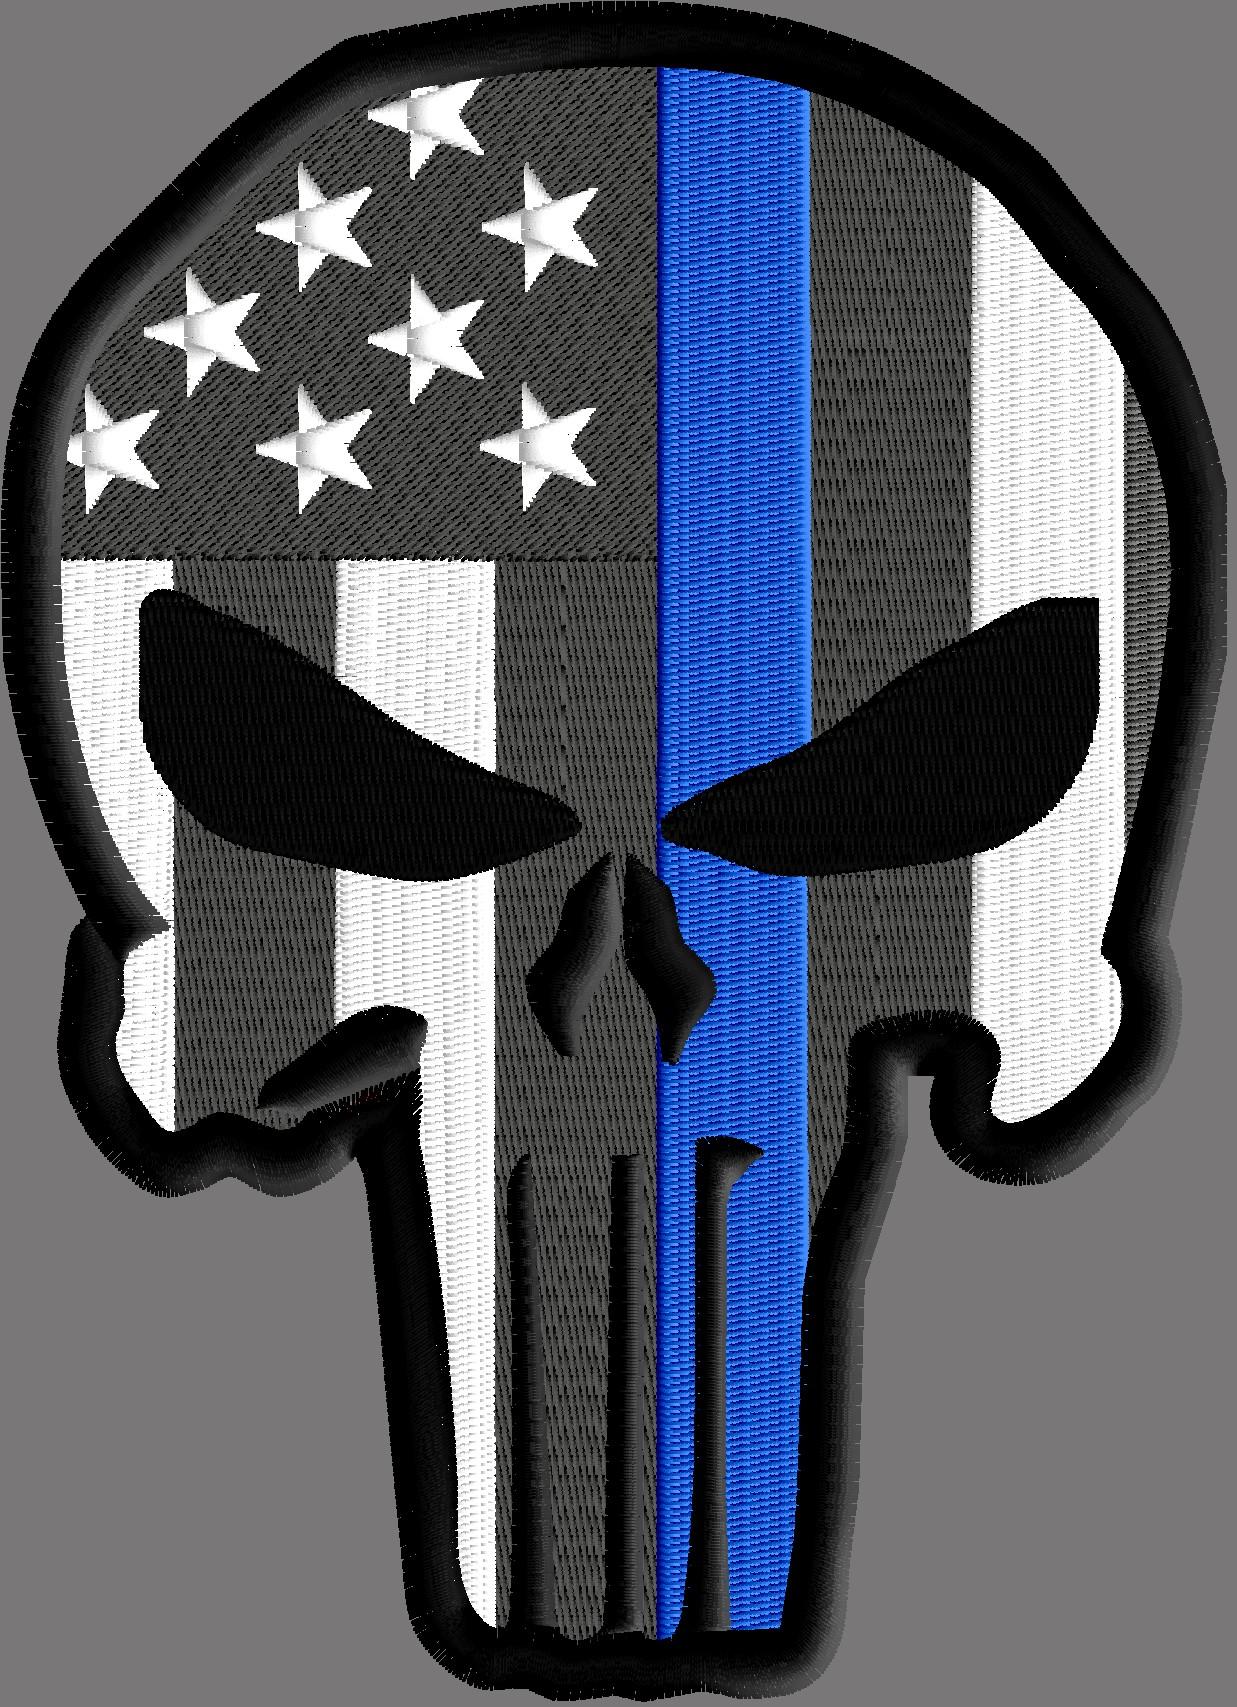 Punisher Police Solidarity Design 3 Sizes Machine